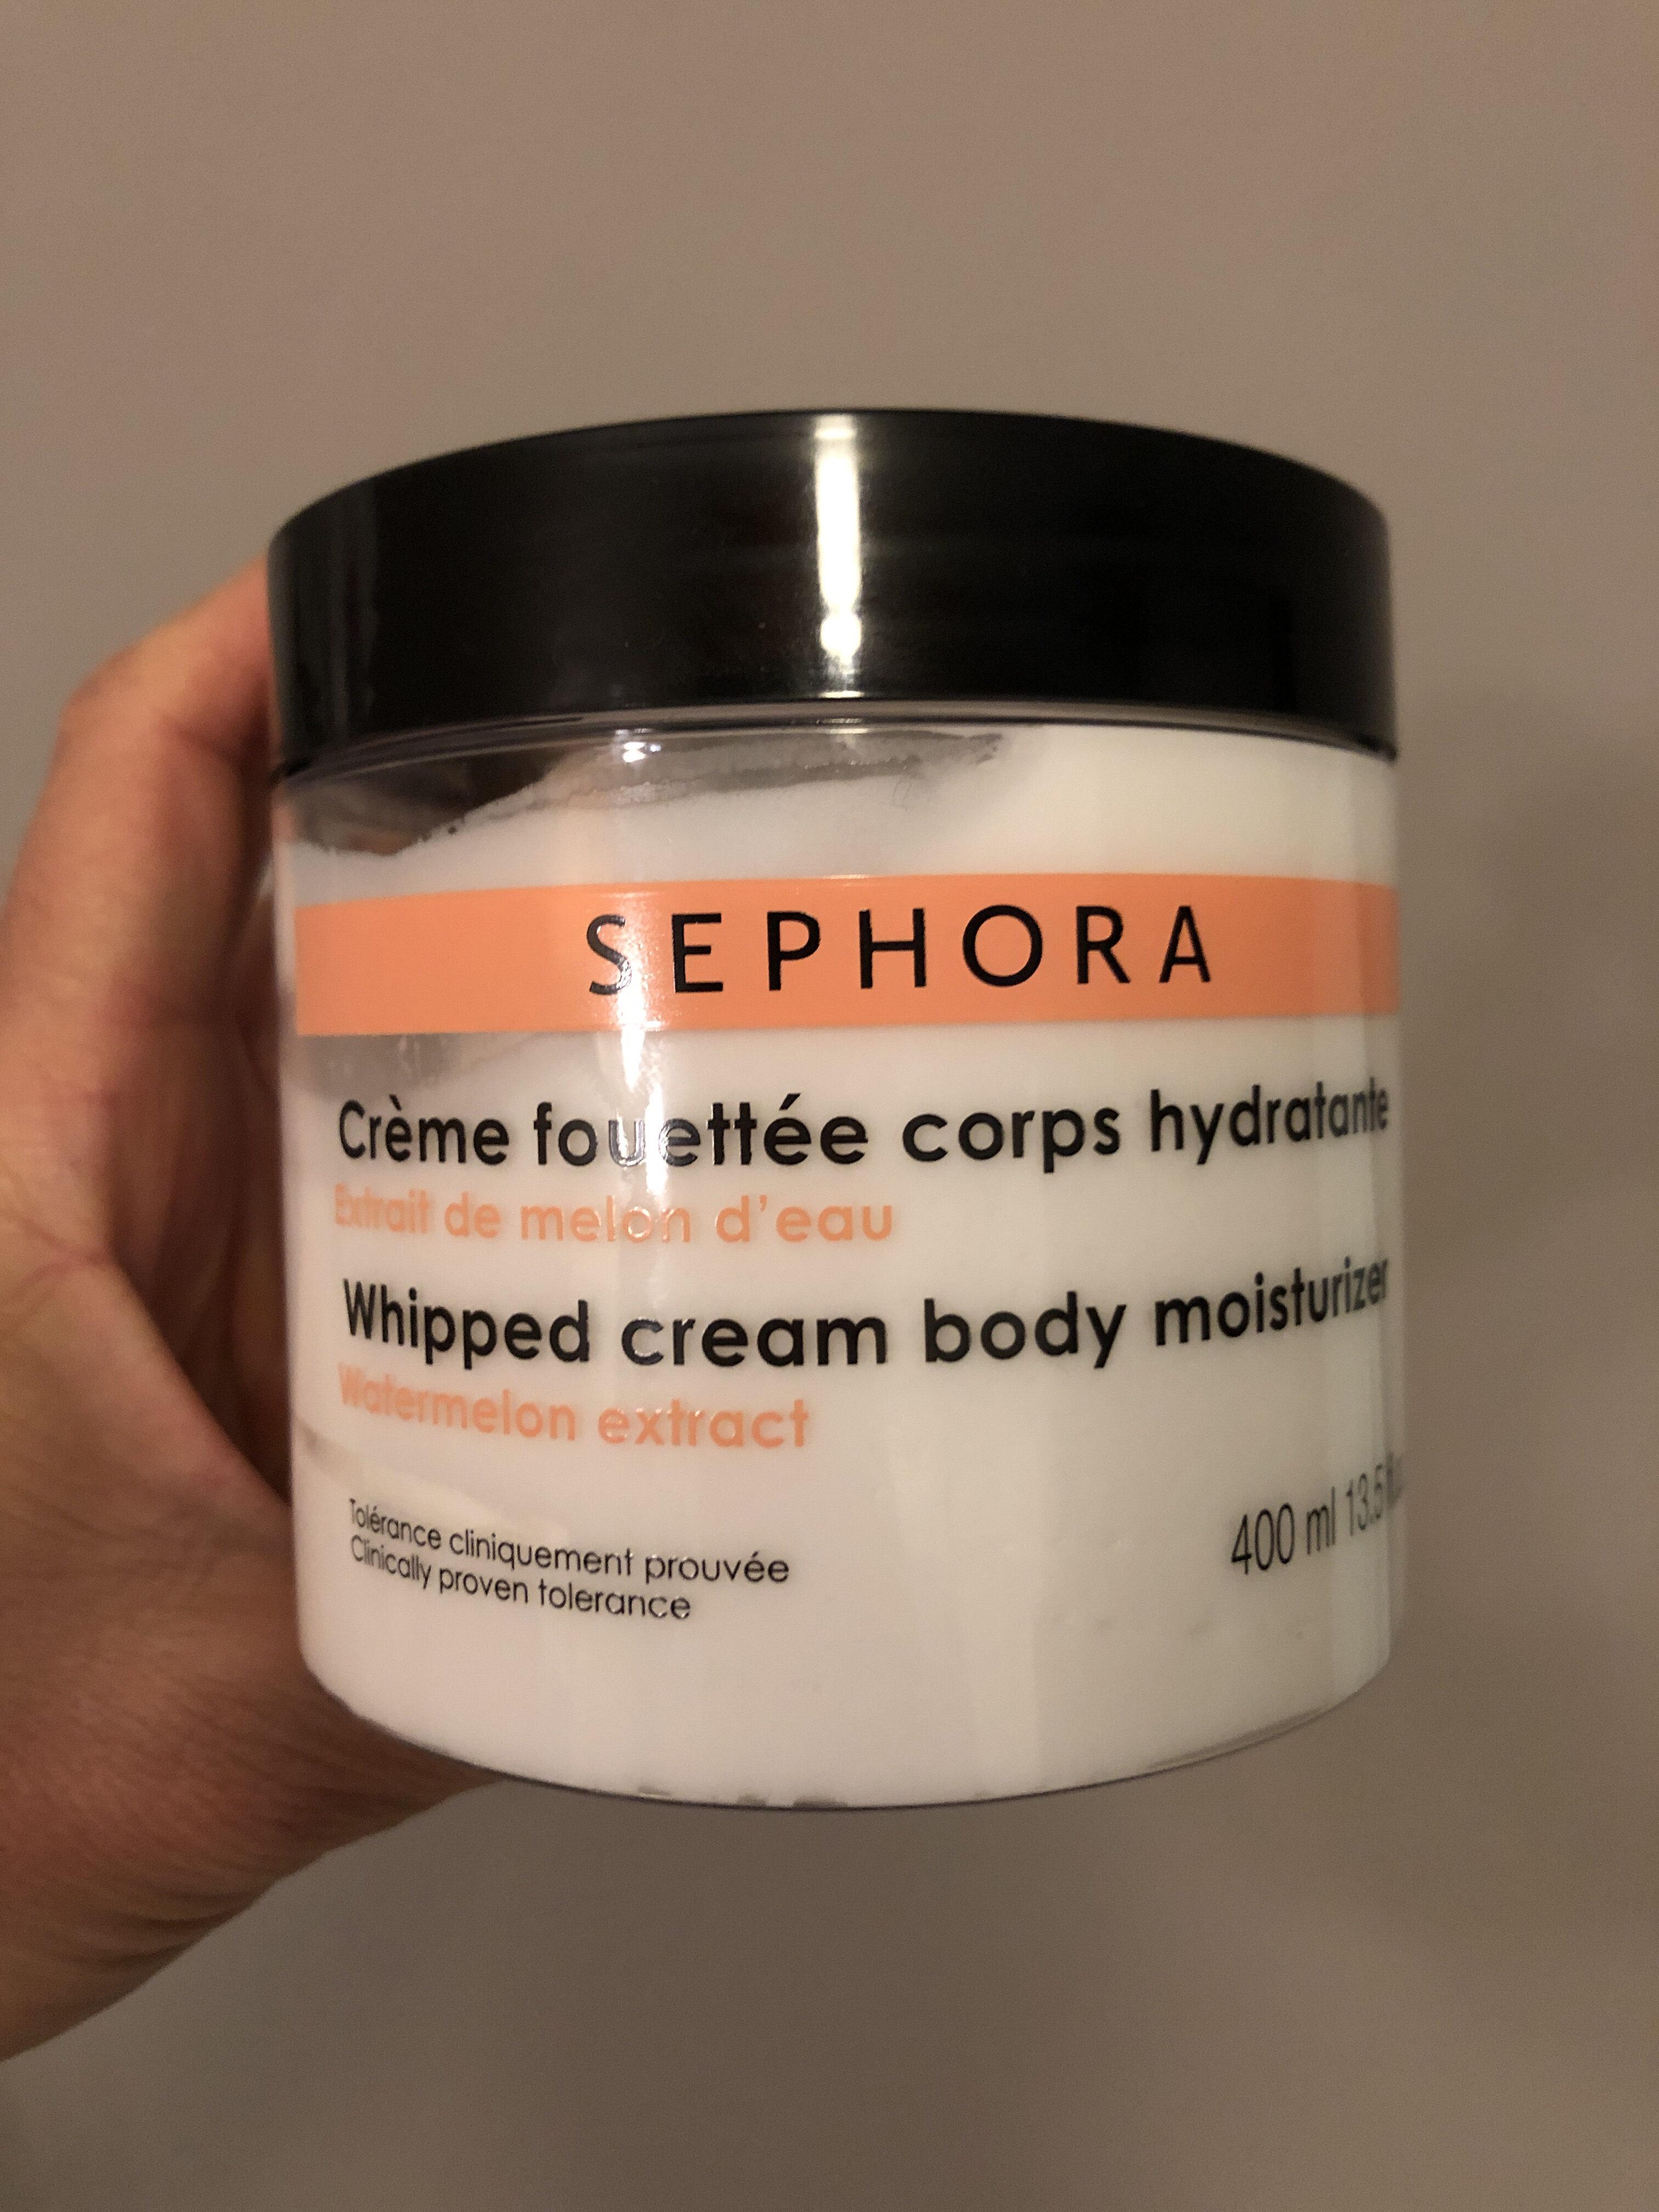 Crème fouettée corps hydratante - Product